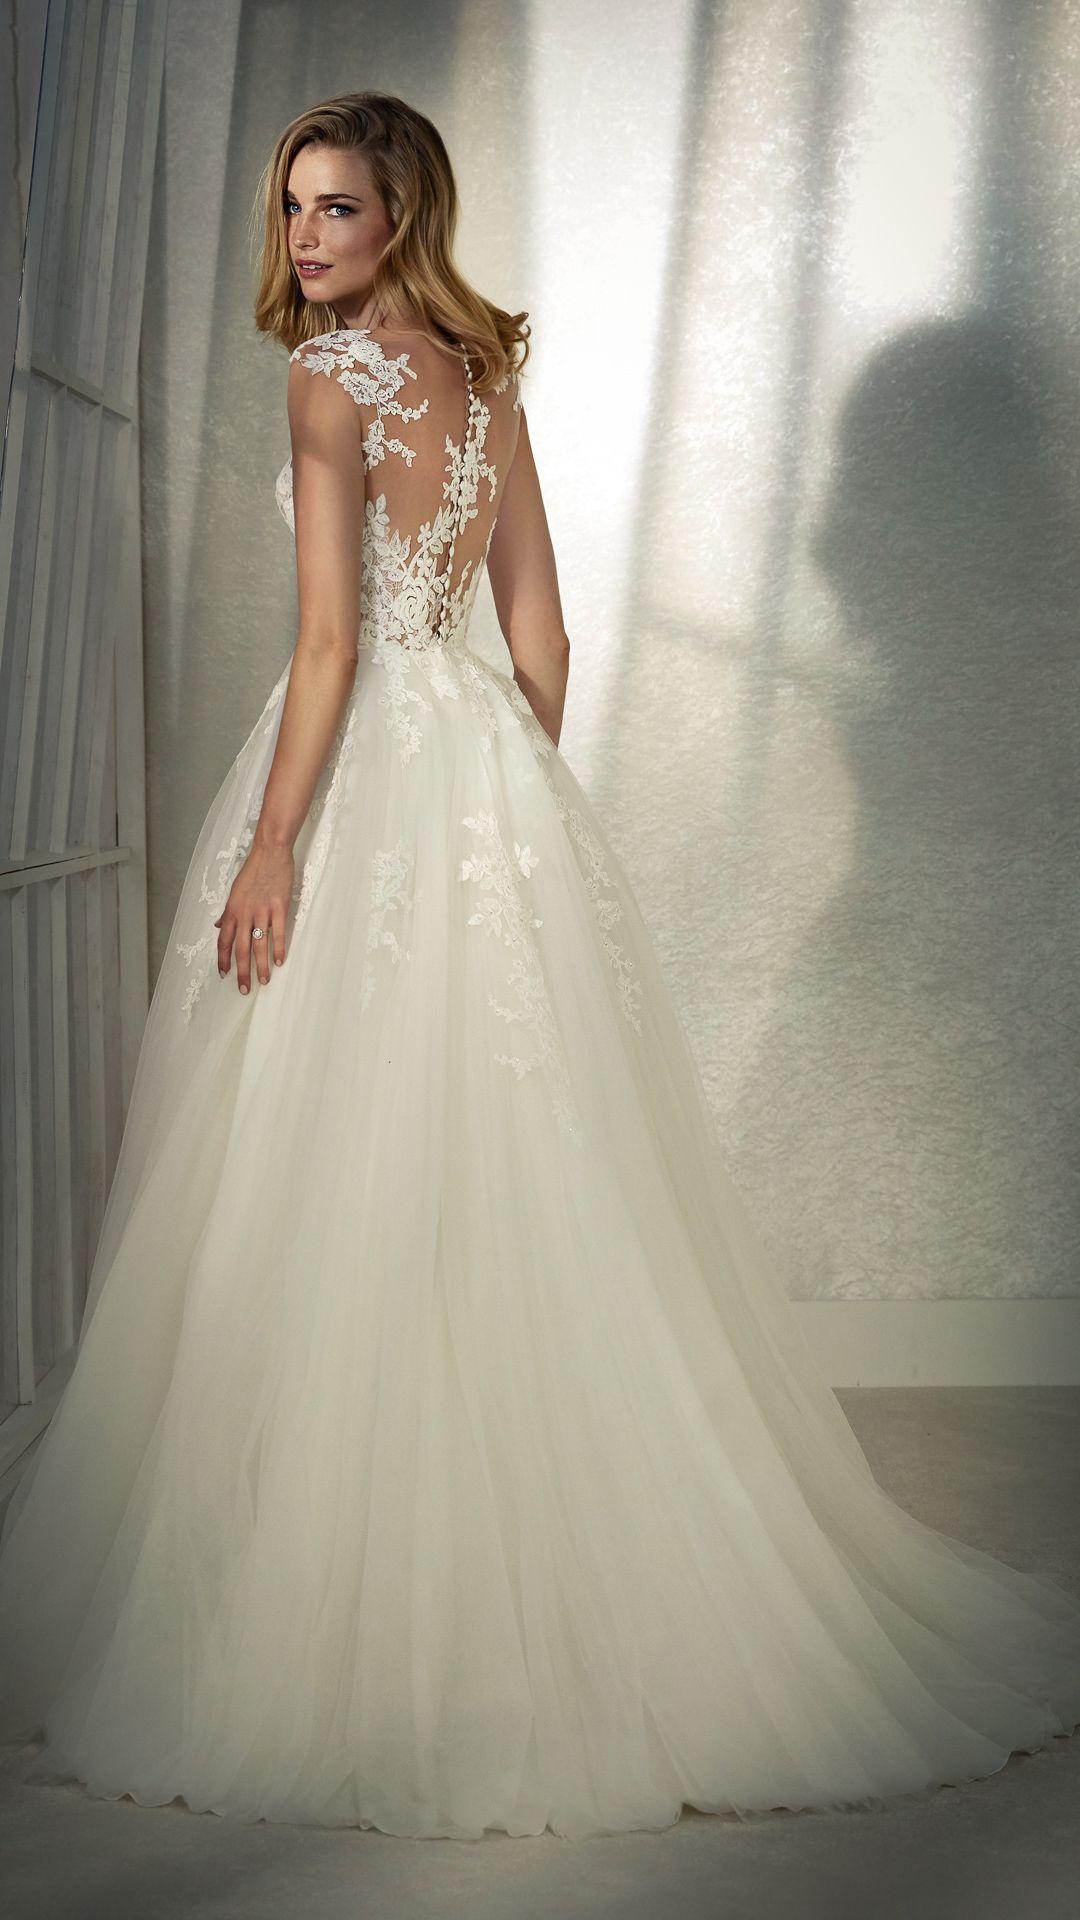 Hochzeitskleider 200 White One Kollektion Modell: FELICIDAD-C-20